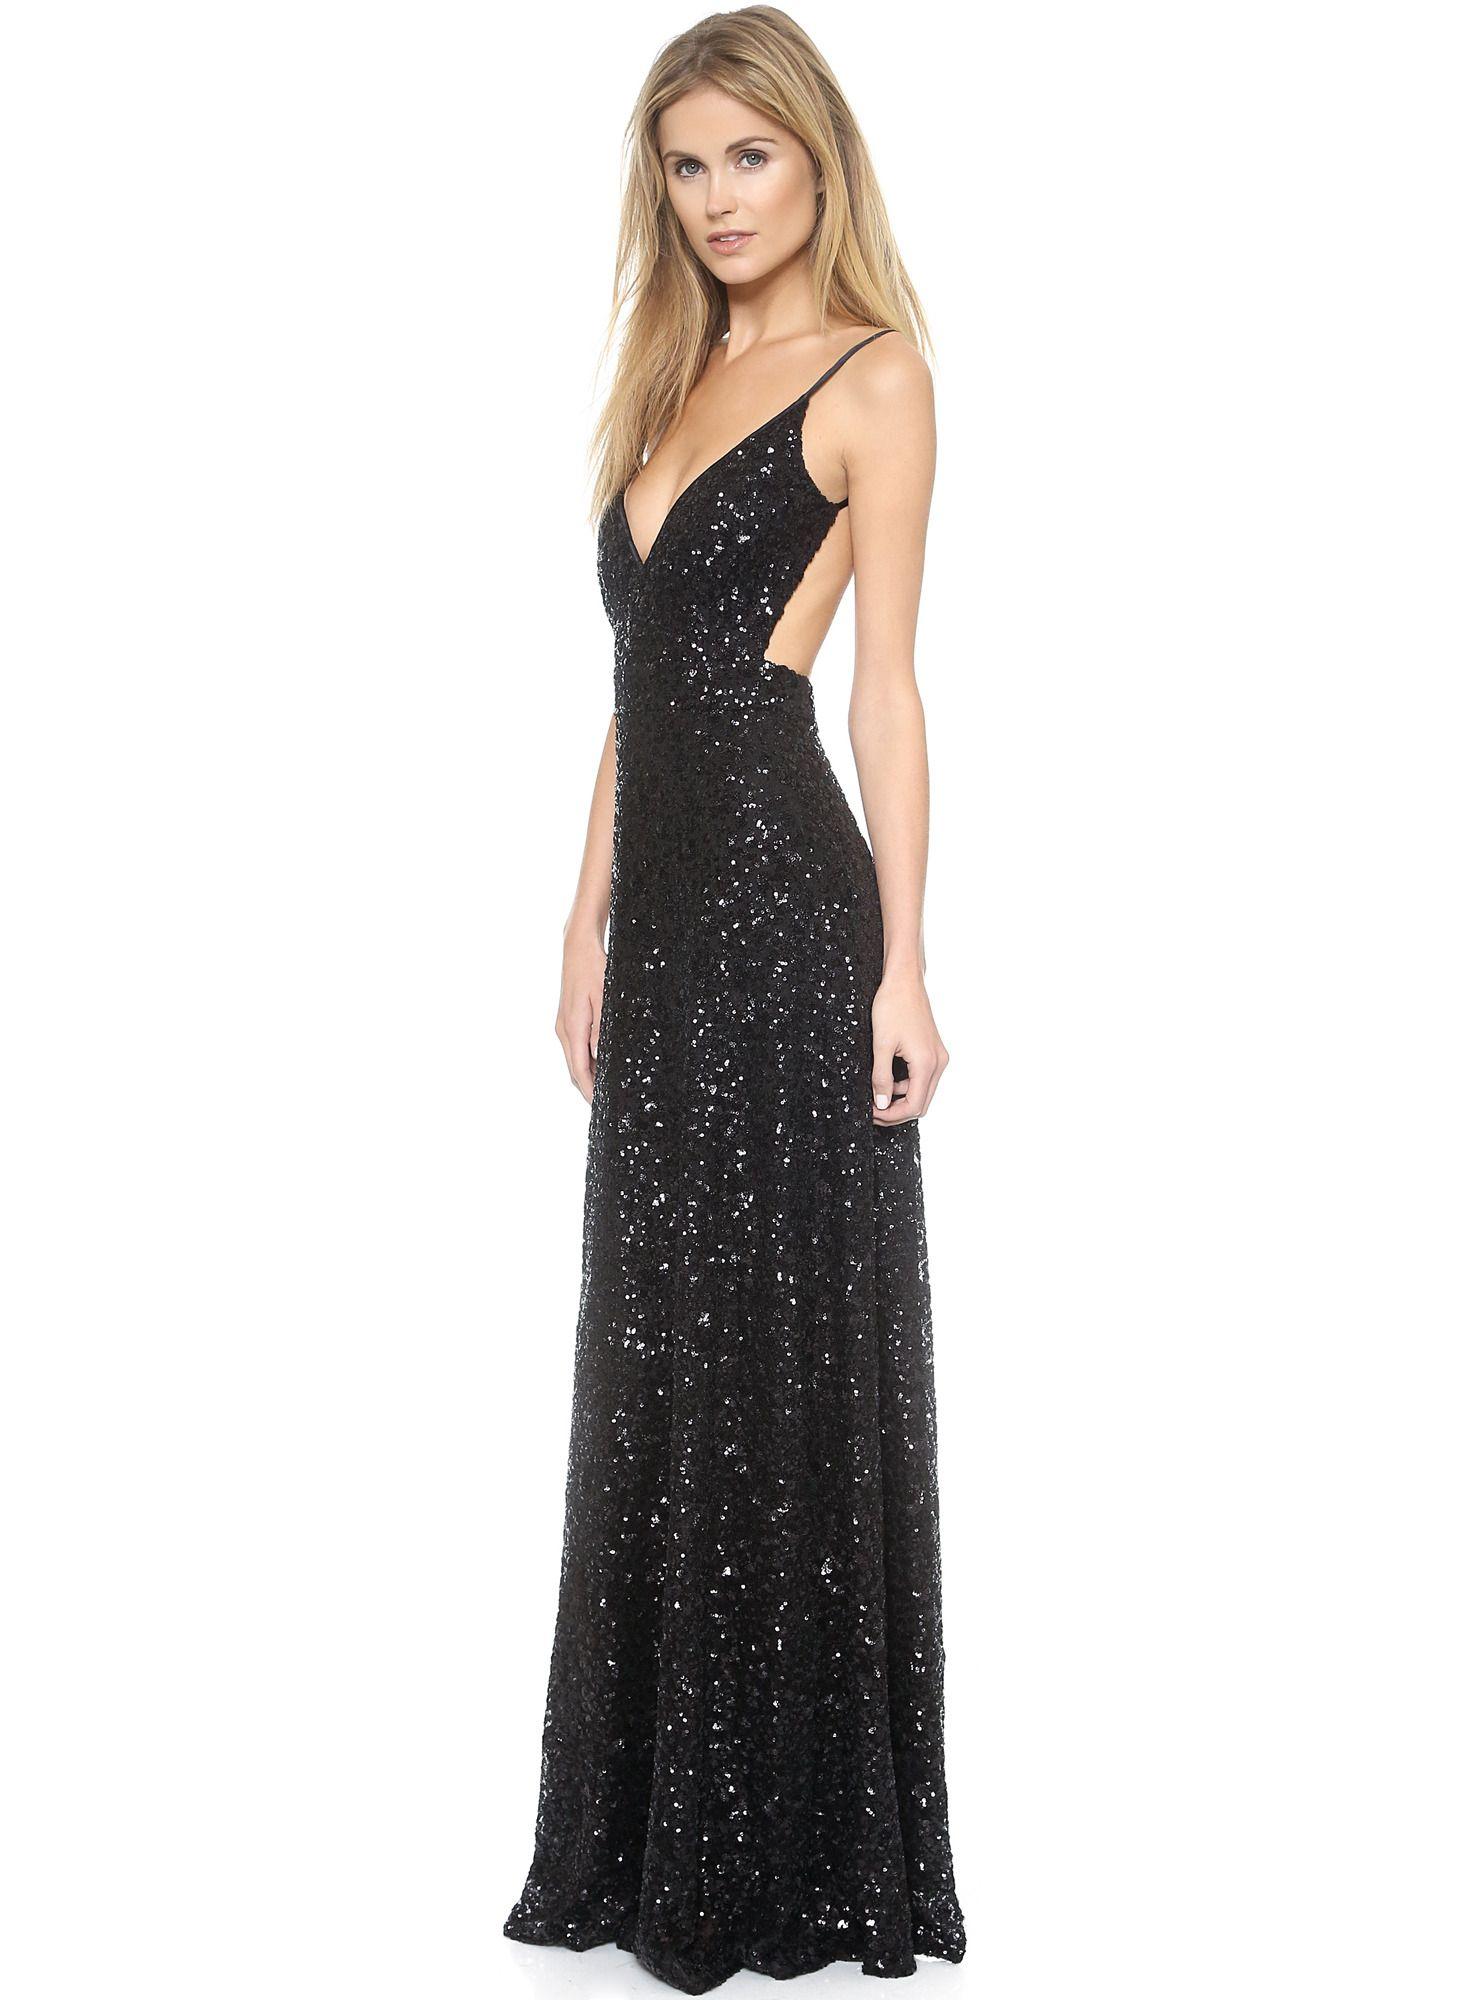 Ebay lace Deep V Neck Slit Belt Loops Printed Lantern Sleeve Three Quarter Sleeve Maxi Dresses jill plus size